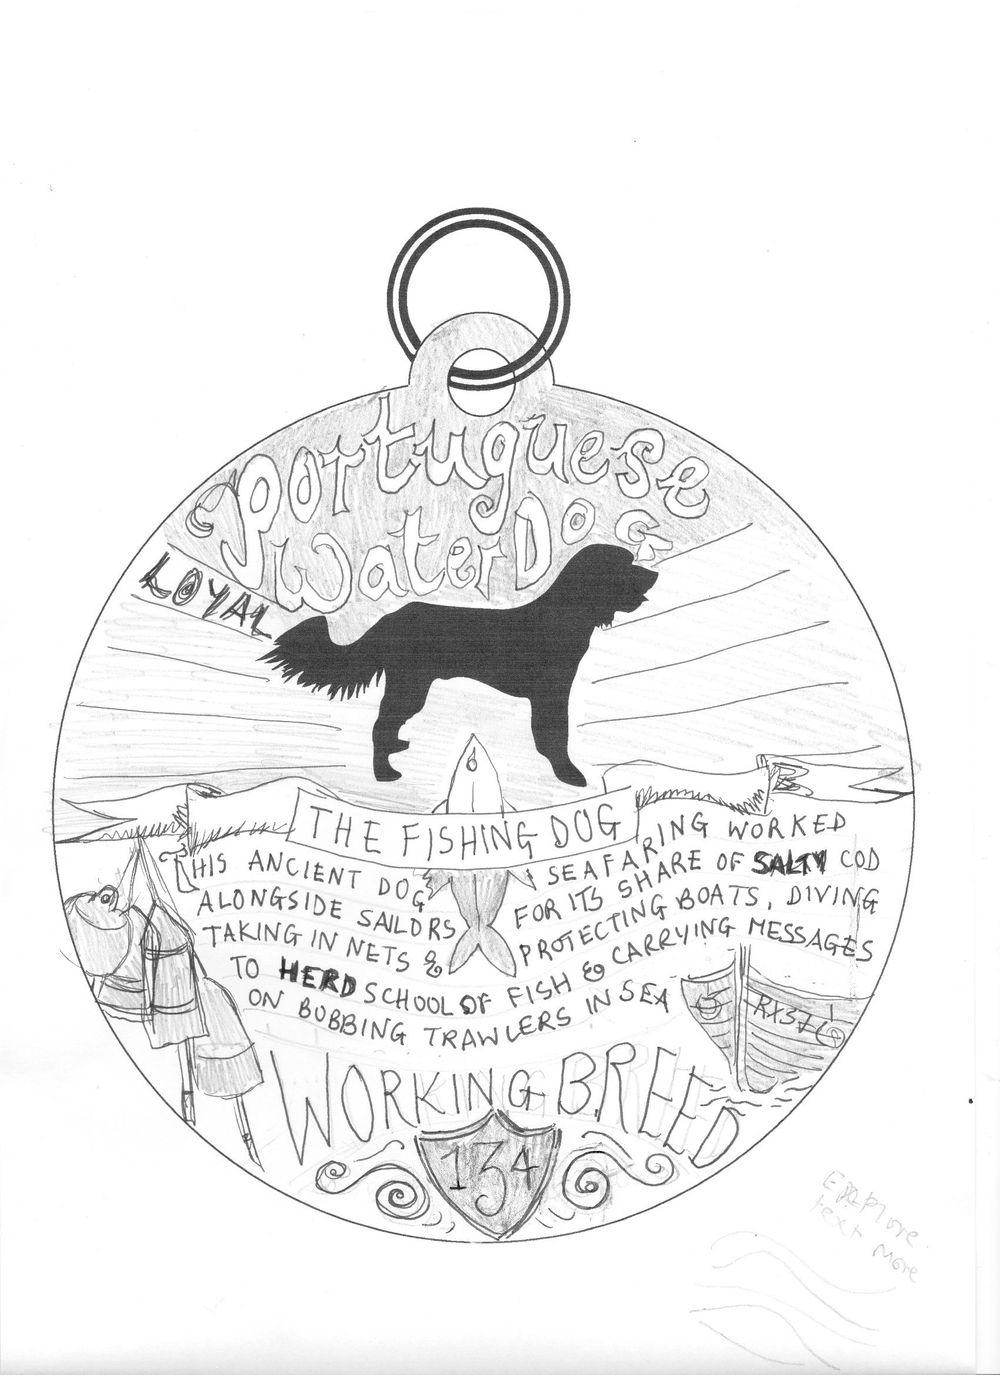 Dog Tag Art Print - image 12 - student project